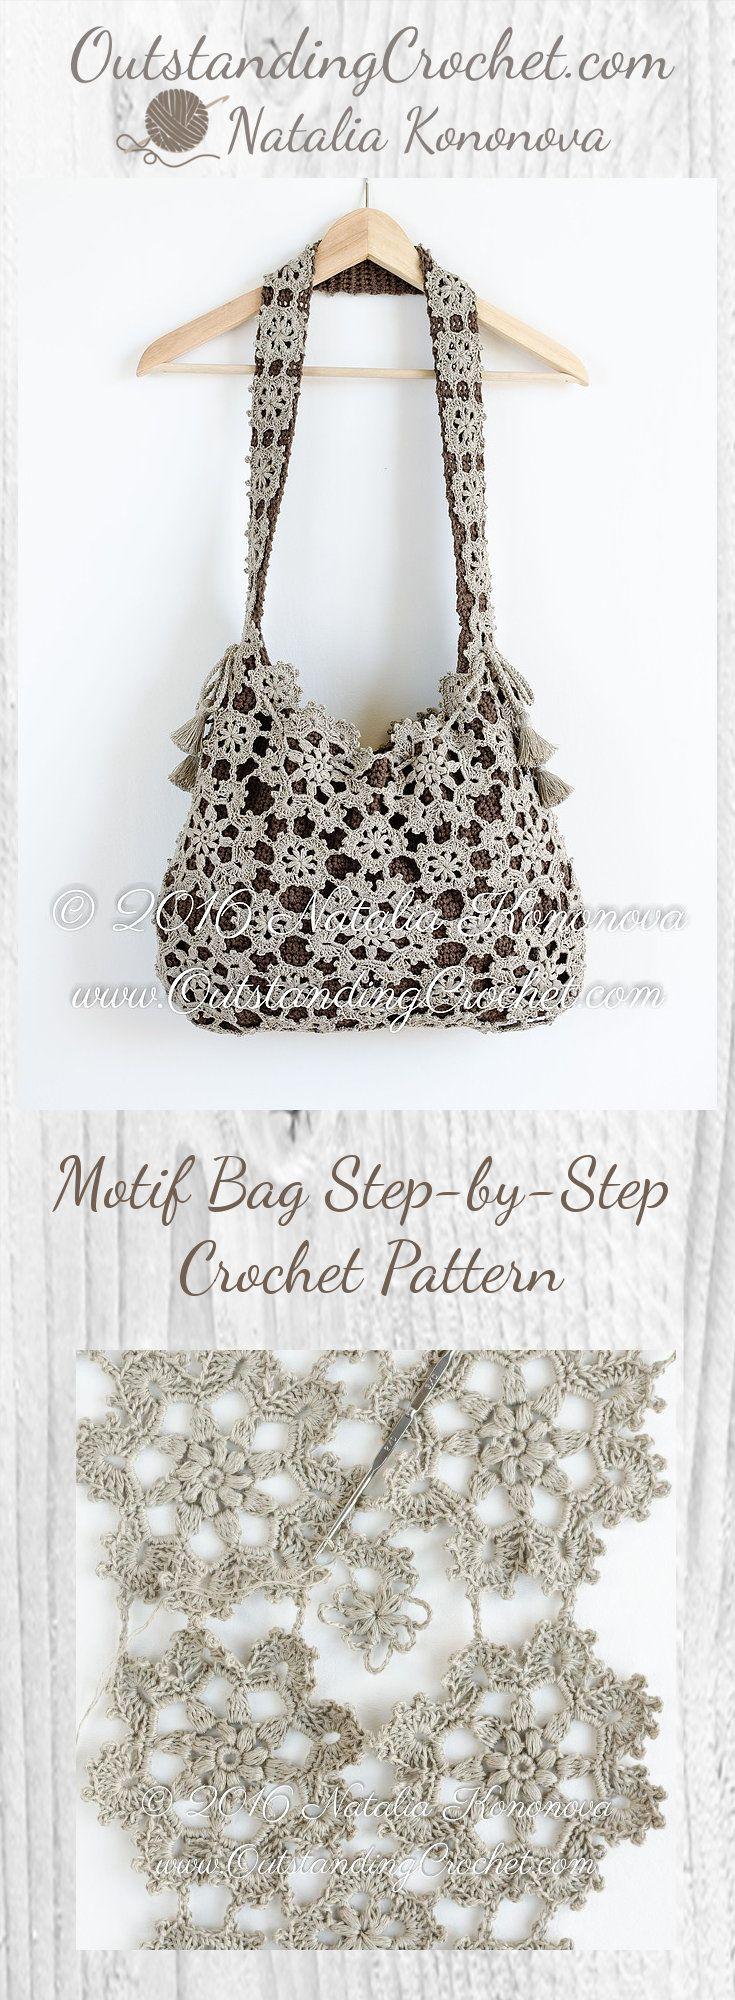 Motif Bag Step-by-Step Crochet Pattern at www.OutstandingCrochet.com